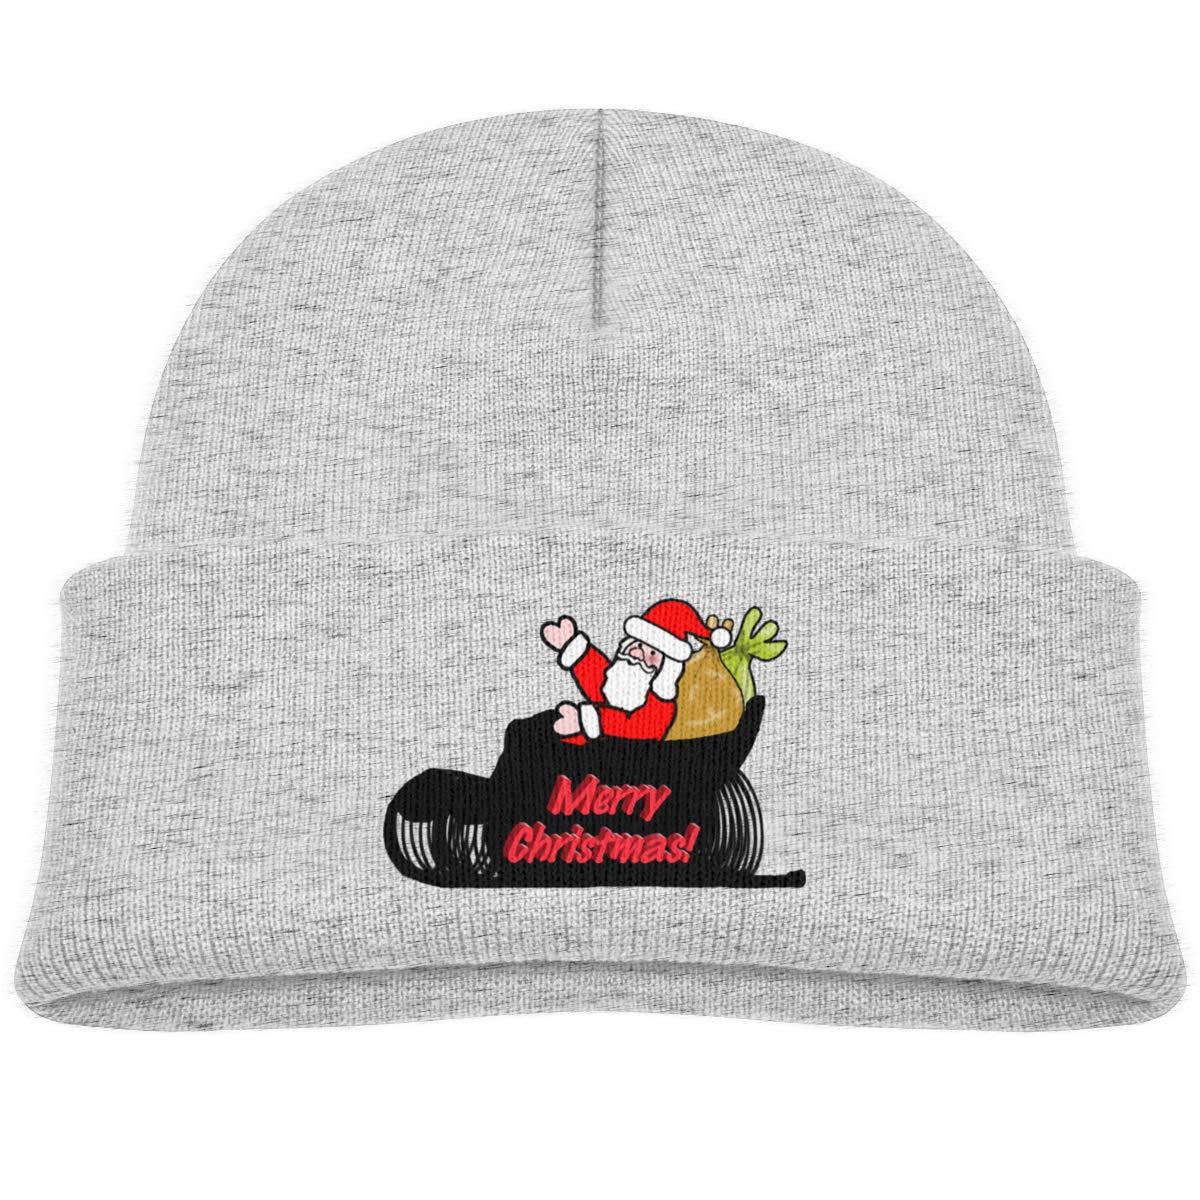 Hanfjj Kefdk Cartoon Santa Sleigh Infant Skull Hats Baby Boy Beanies Cap